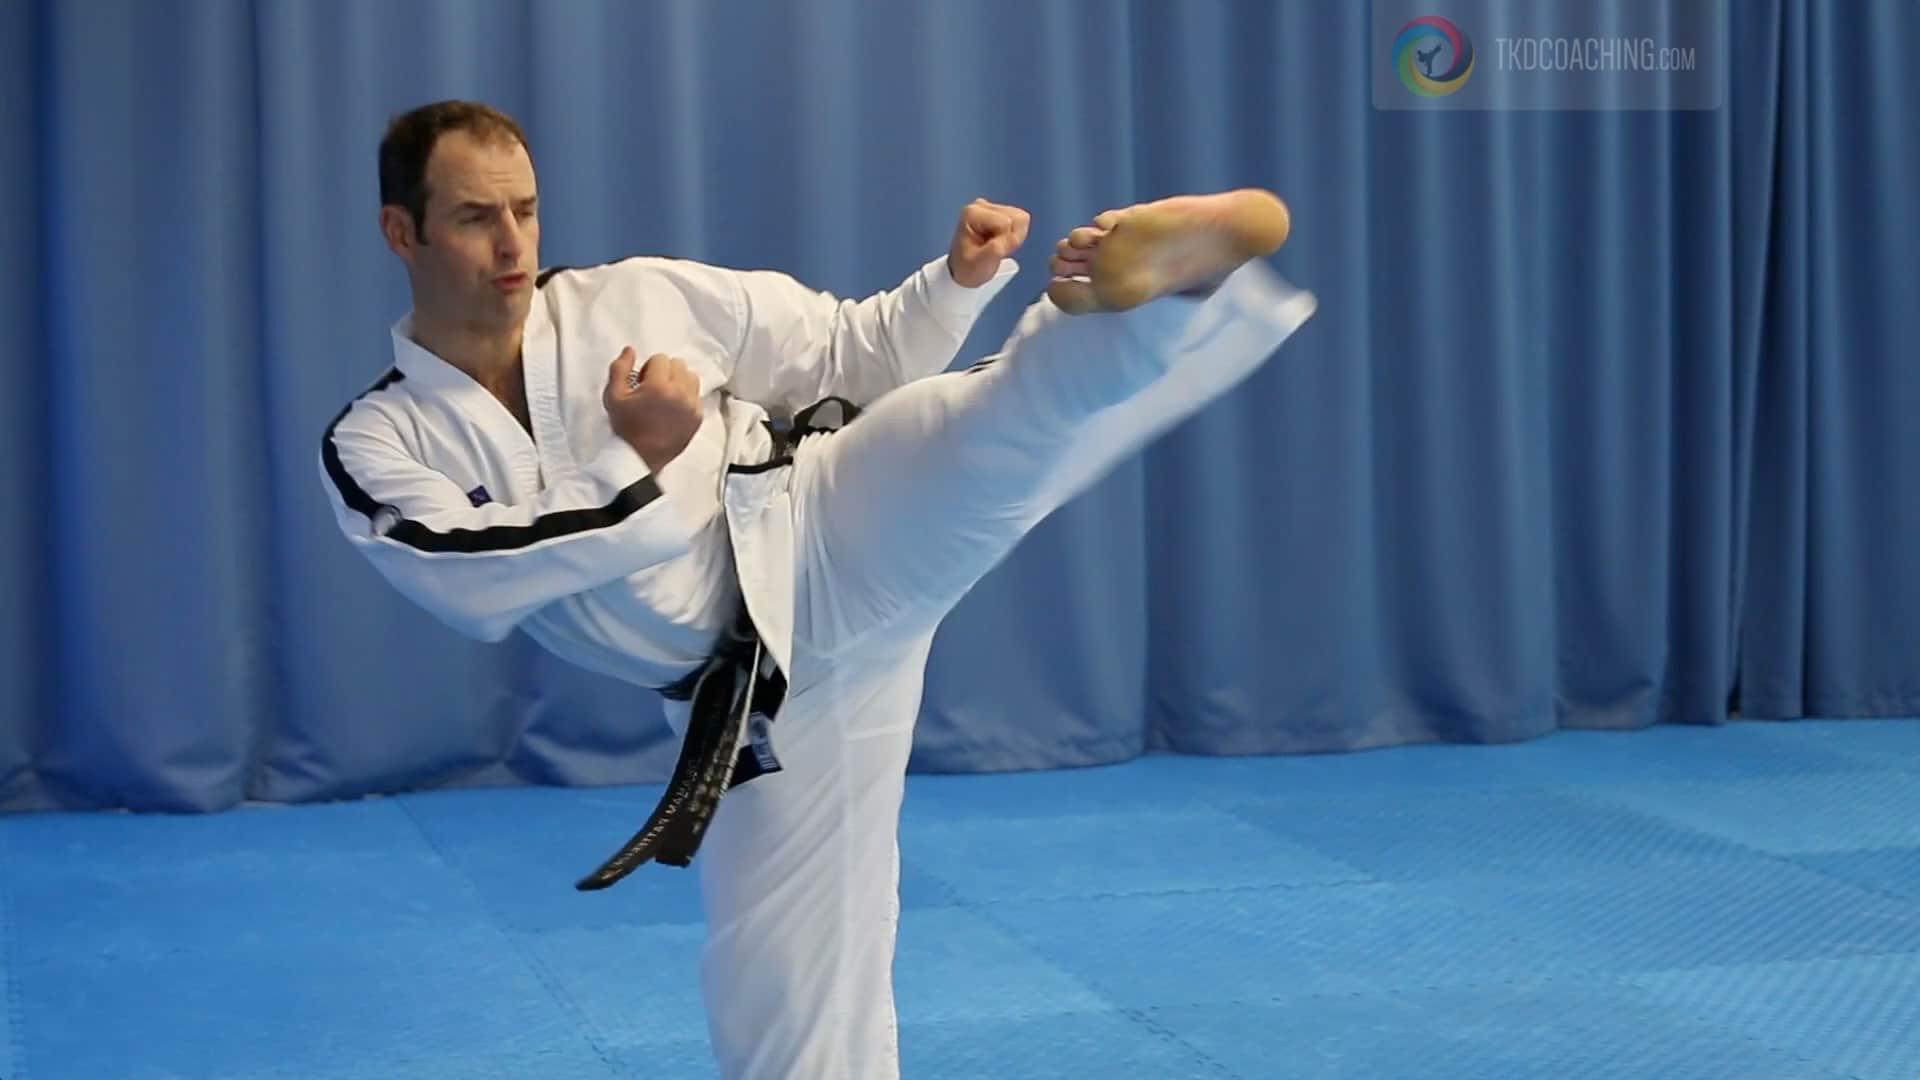 Master Gray Patterson Turning Kick